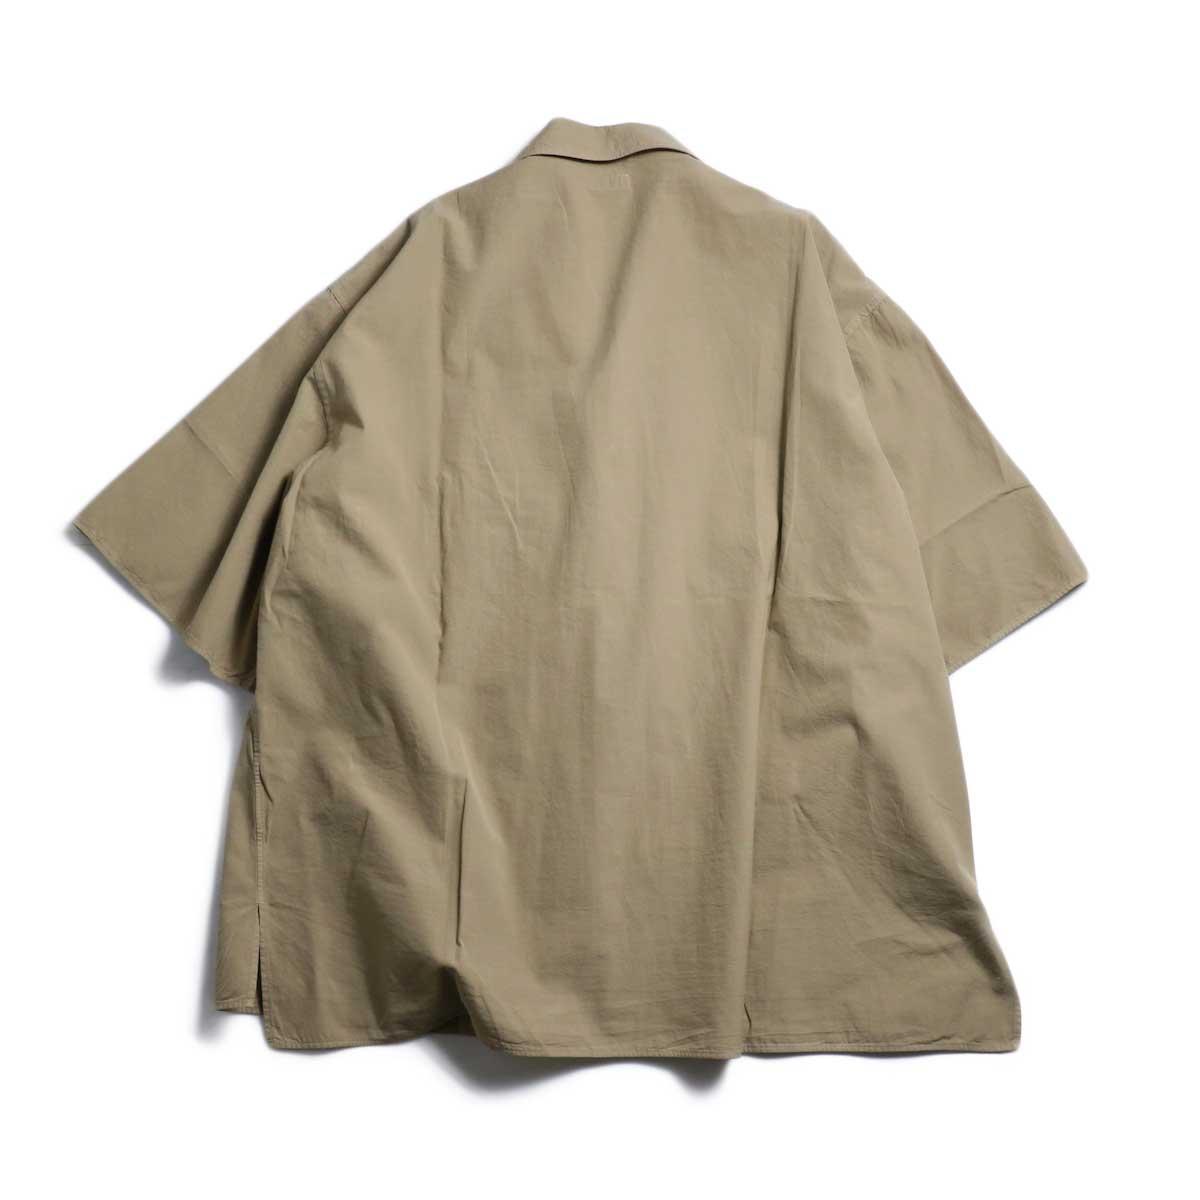 blurhms / Polish Chambray Wide Sleeve Box Shirt -Beige 背面